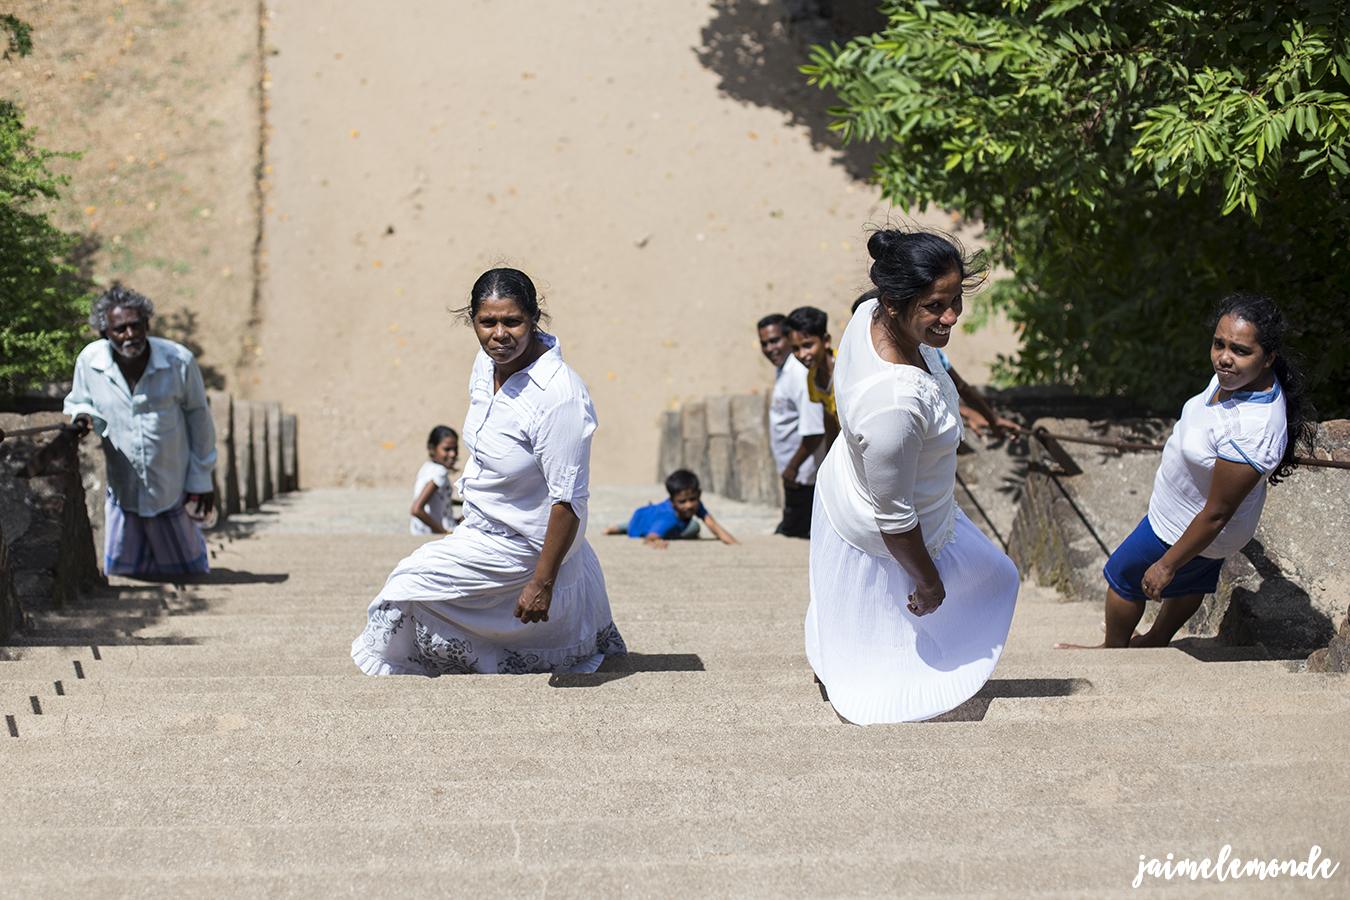 Portraits de voyage au Sri Lanka ©jaimelemonde (15)